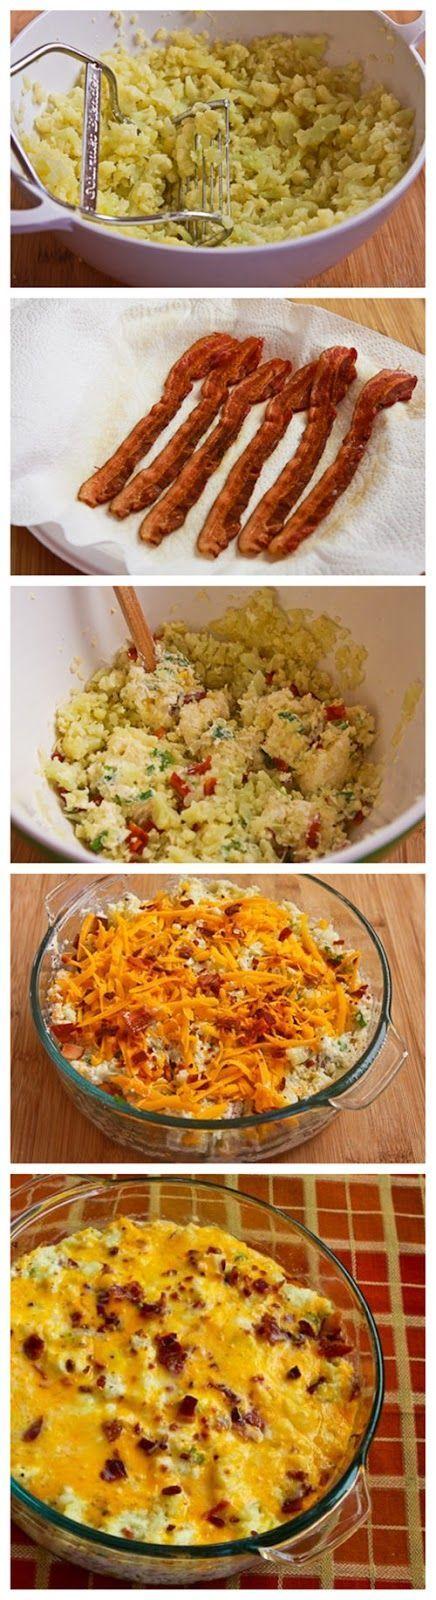 Twice Baked Cauliflower - a lighter alternative to twice baked potatoes